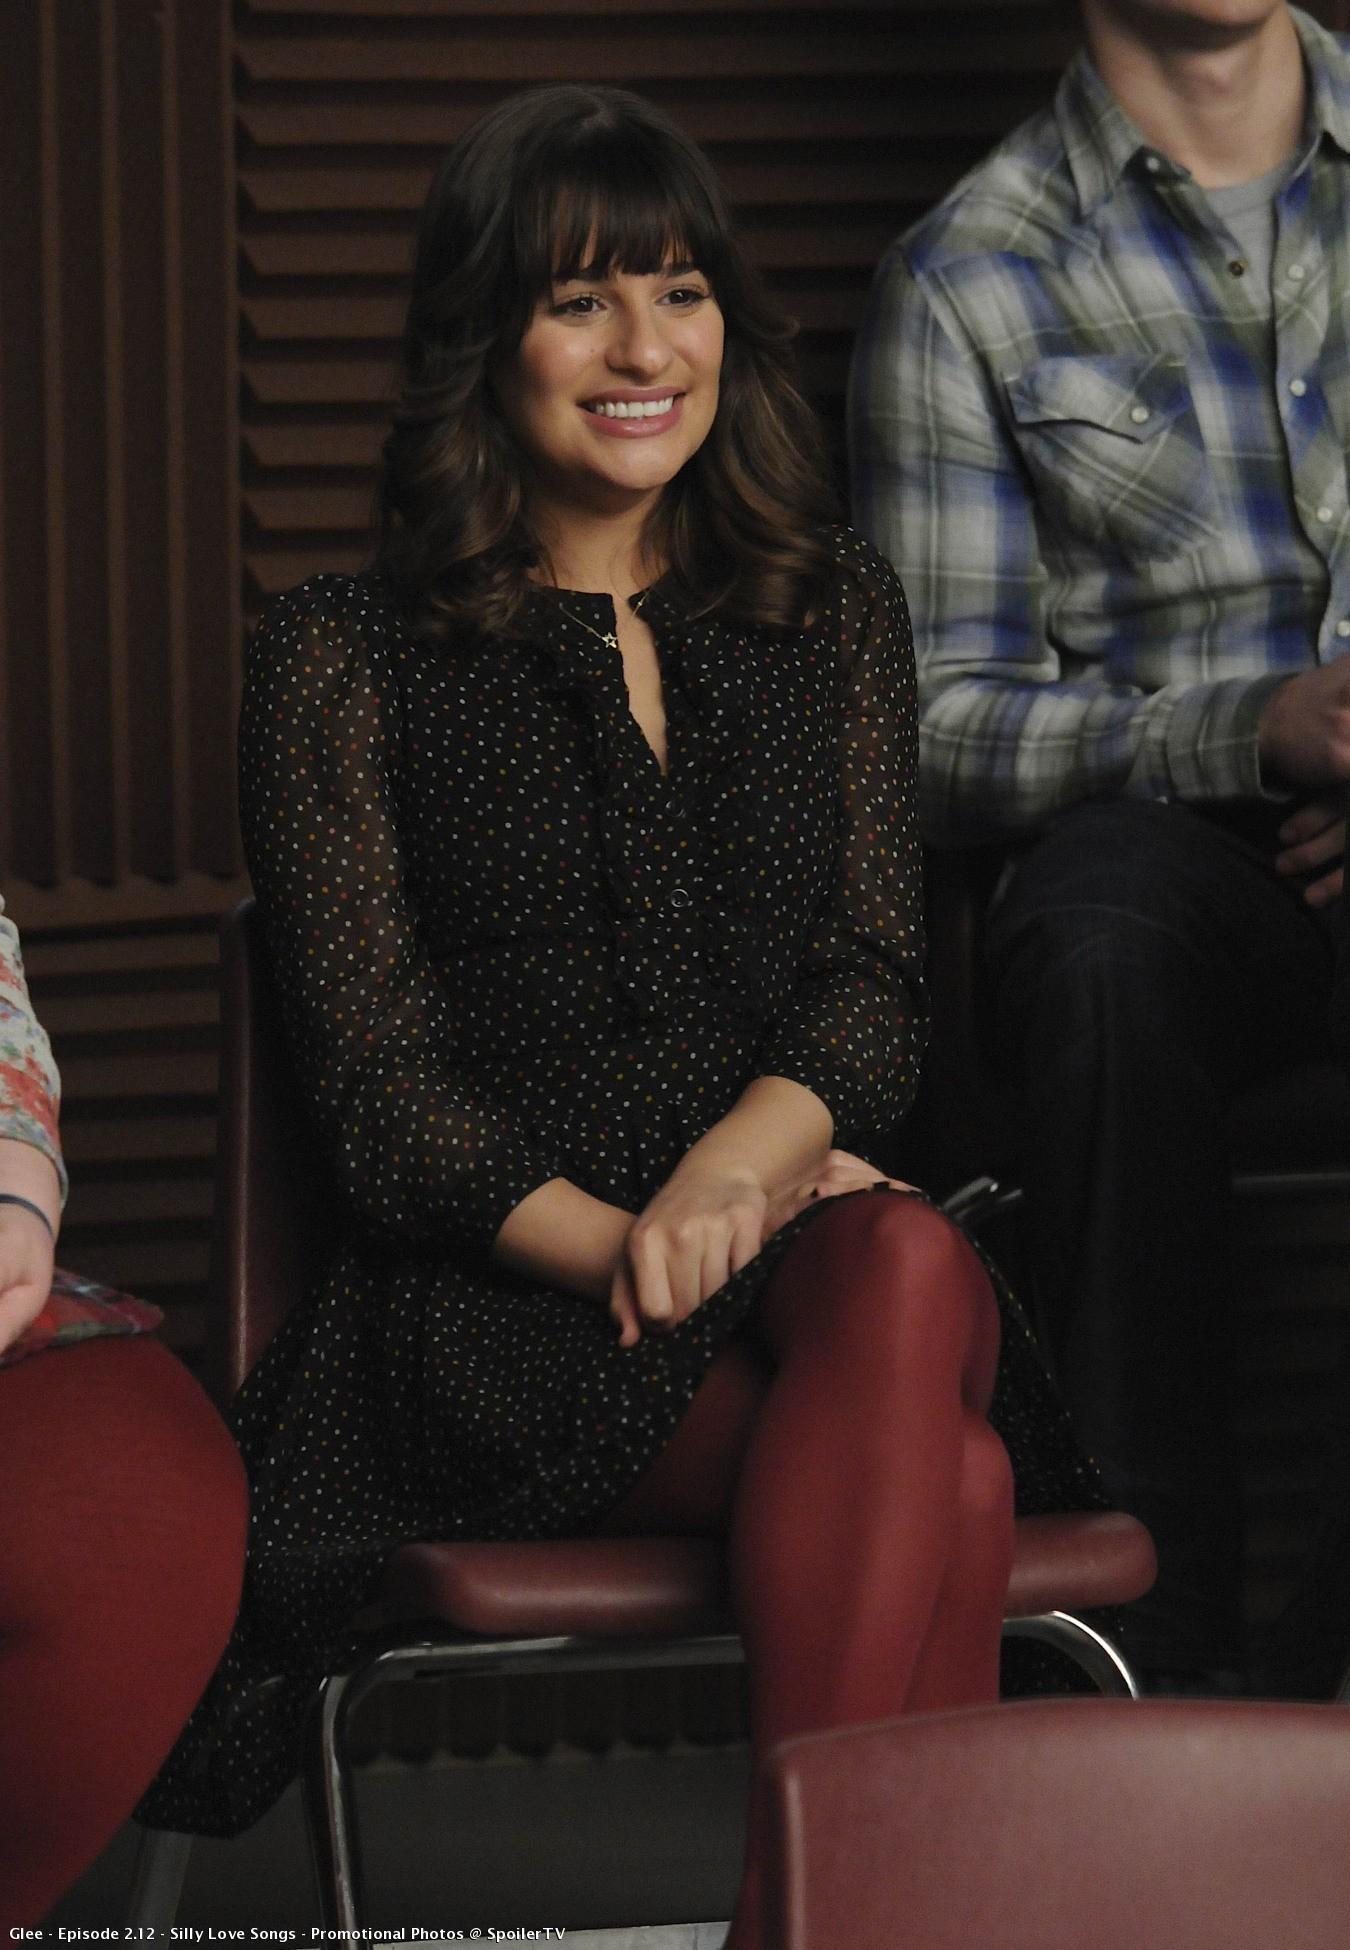 Rachel 2x12 'Silly 爱情 Songs' Promo Pic